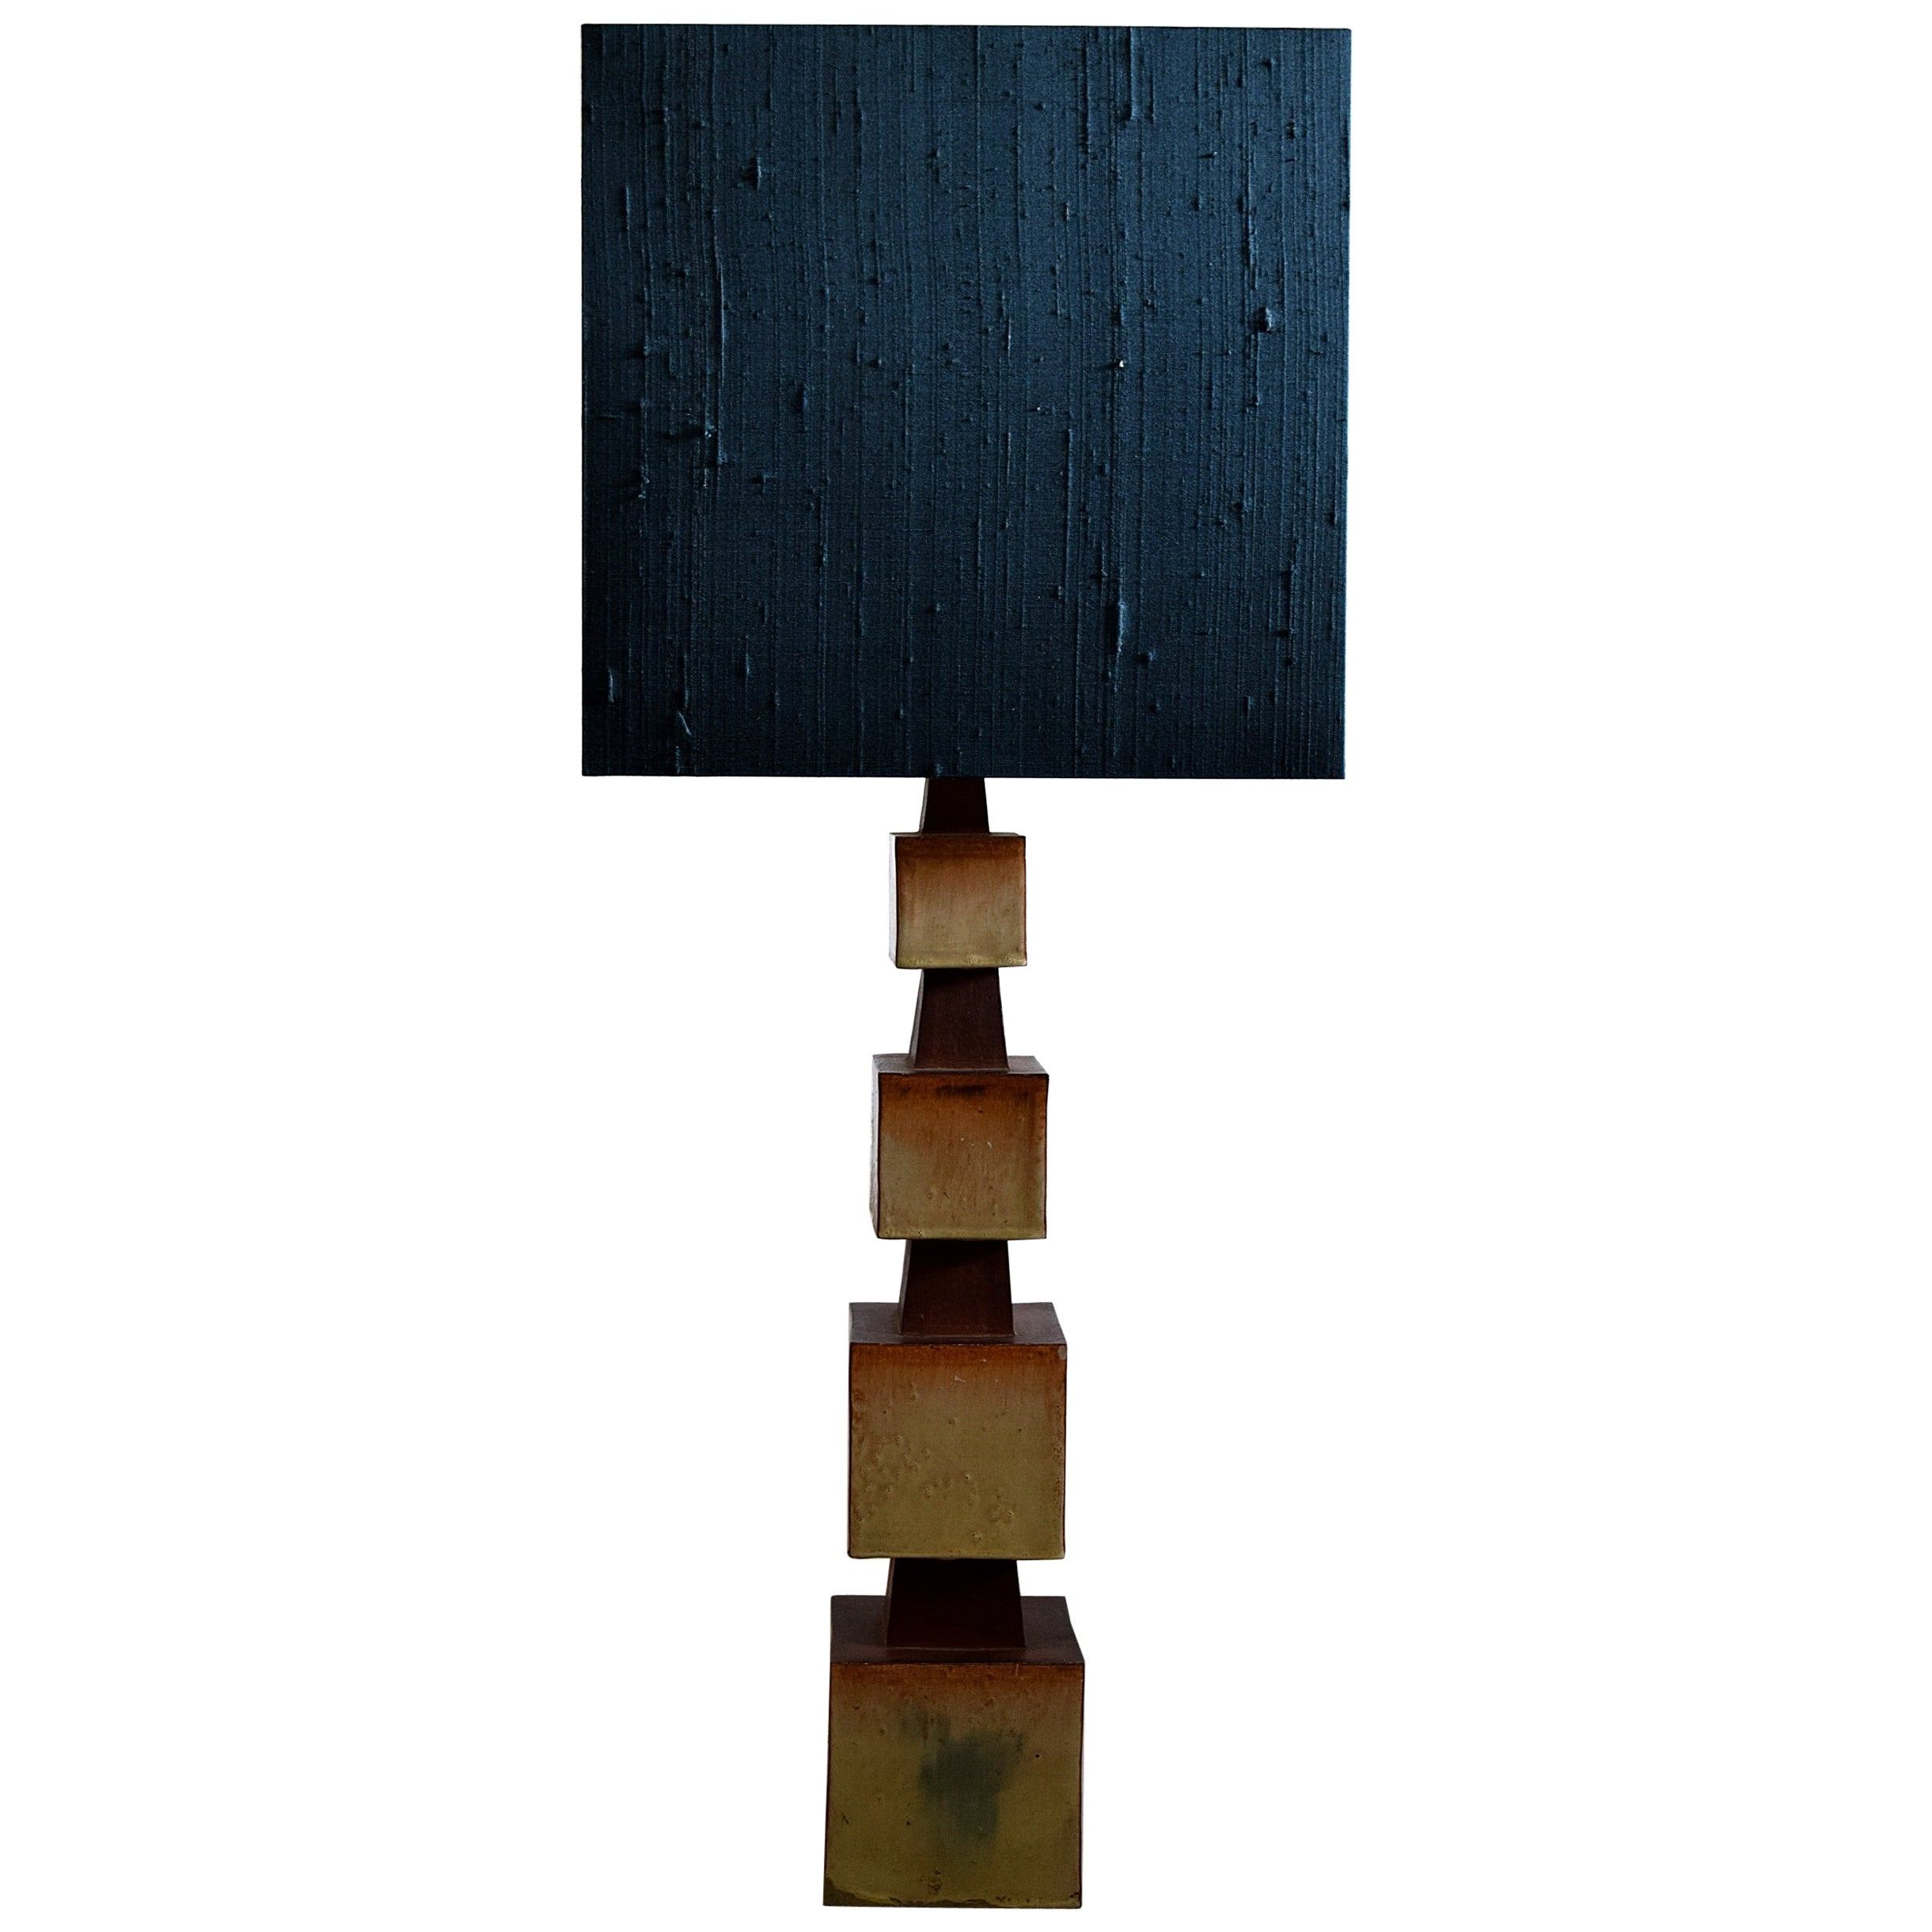 Midcentury Beige and Blue Ceramic Table Lamp